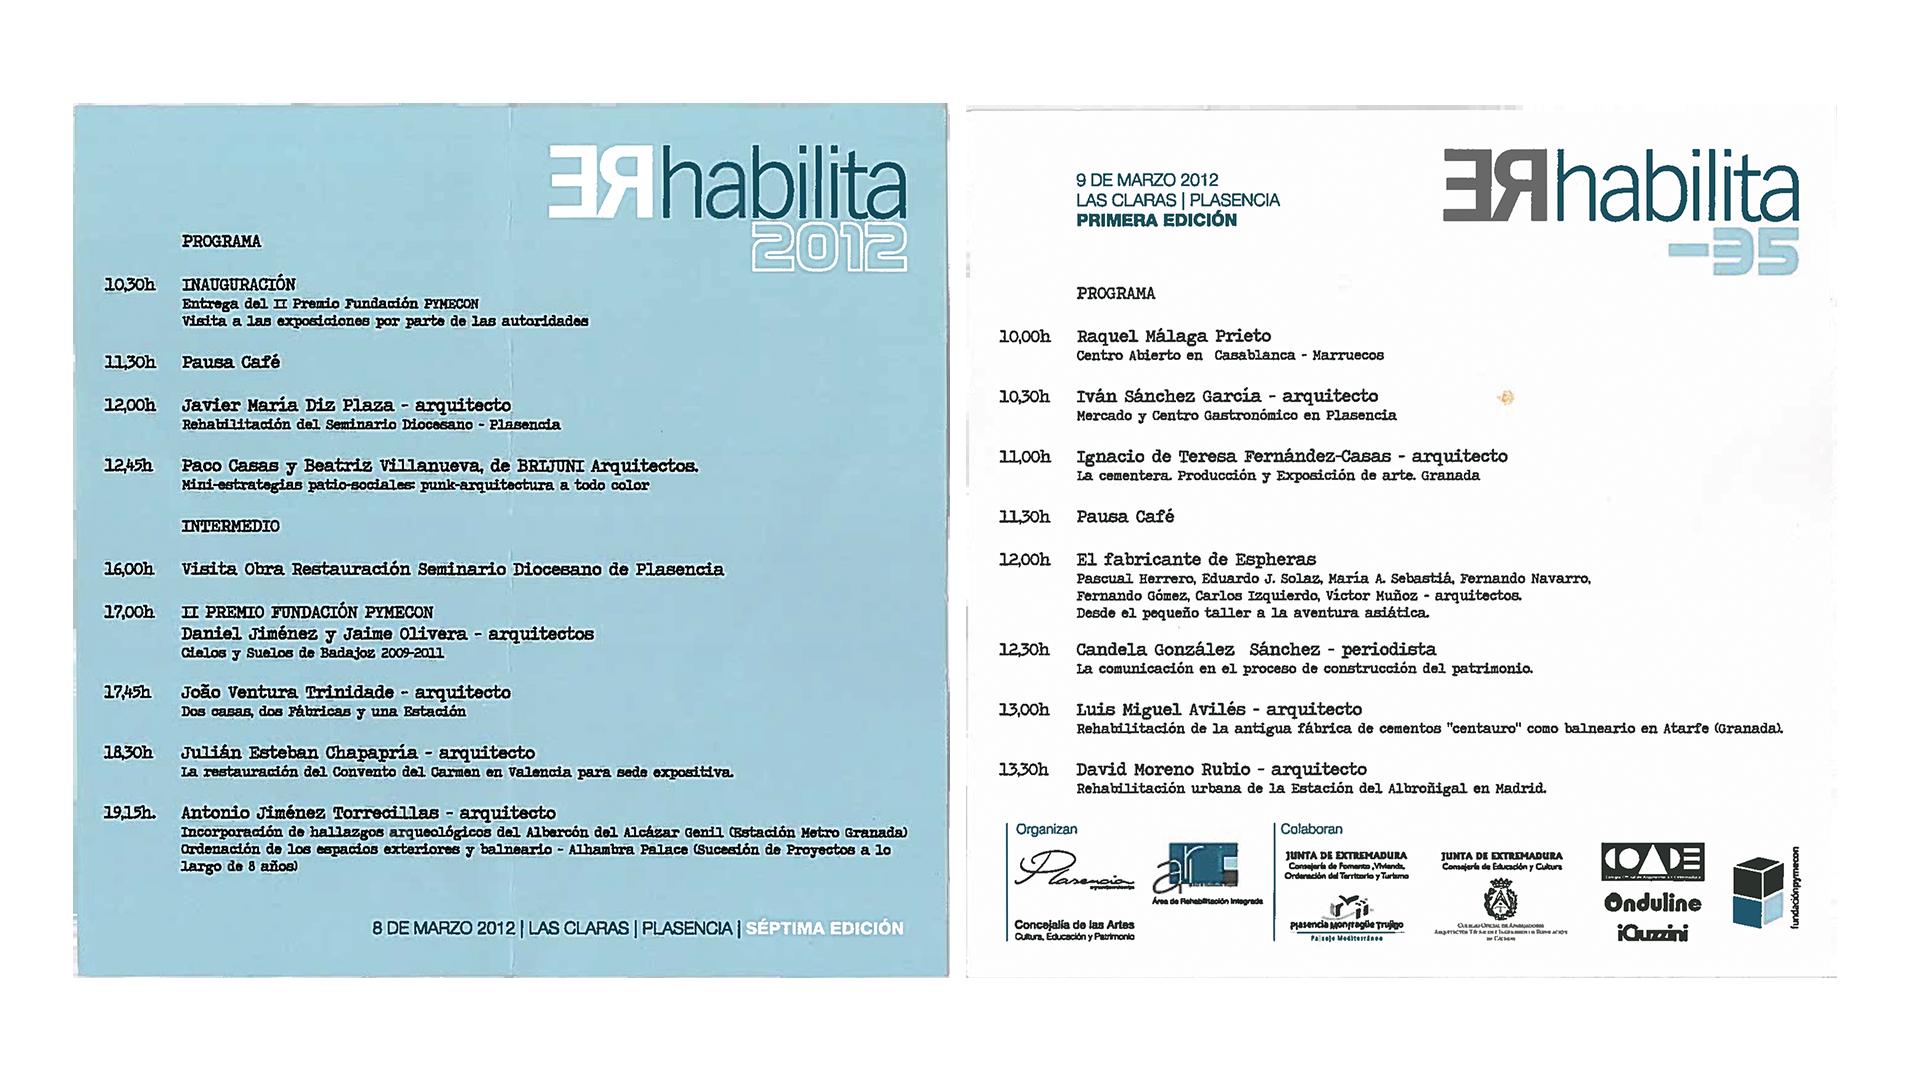 programa rehabilita 2012 plasencia